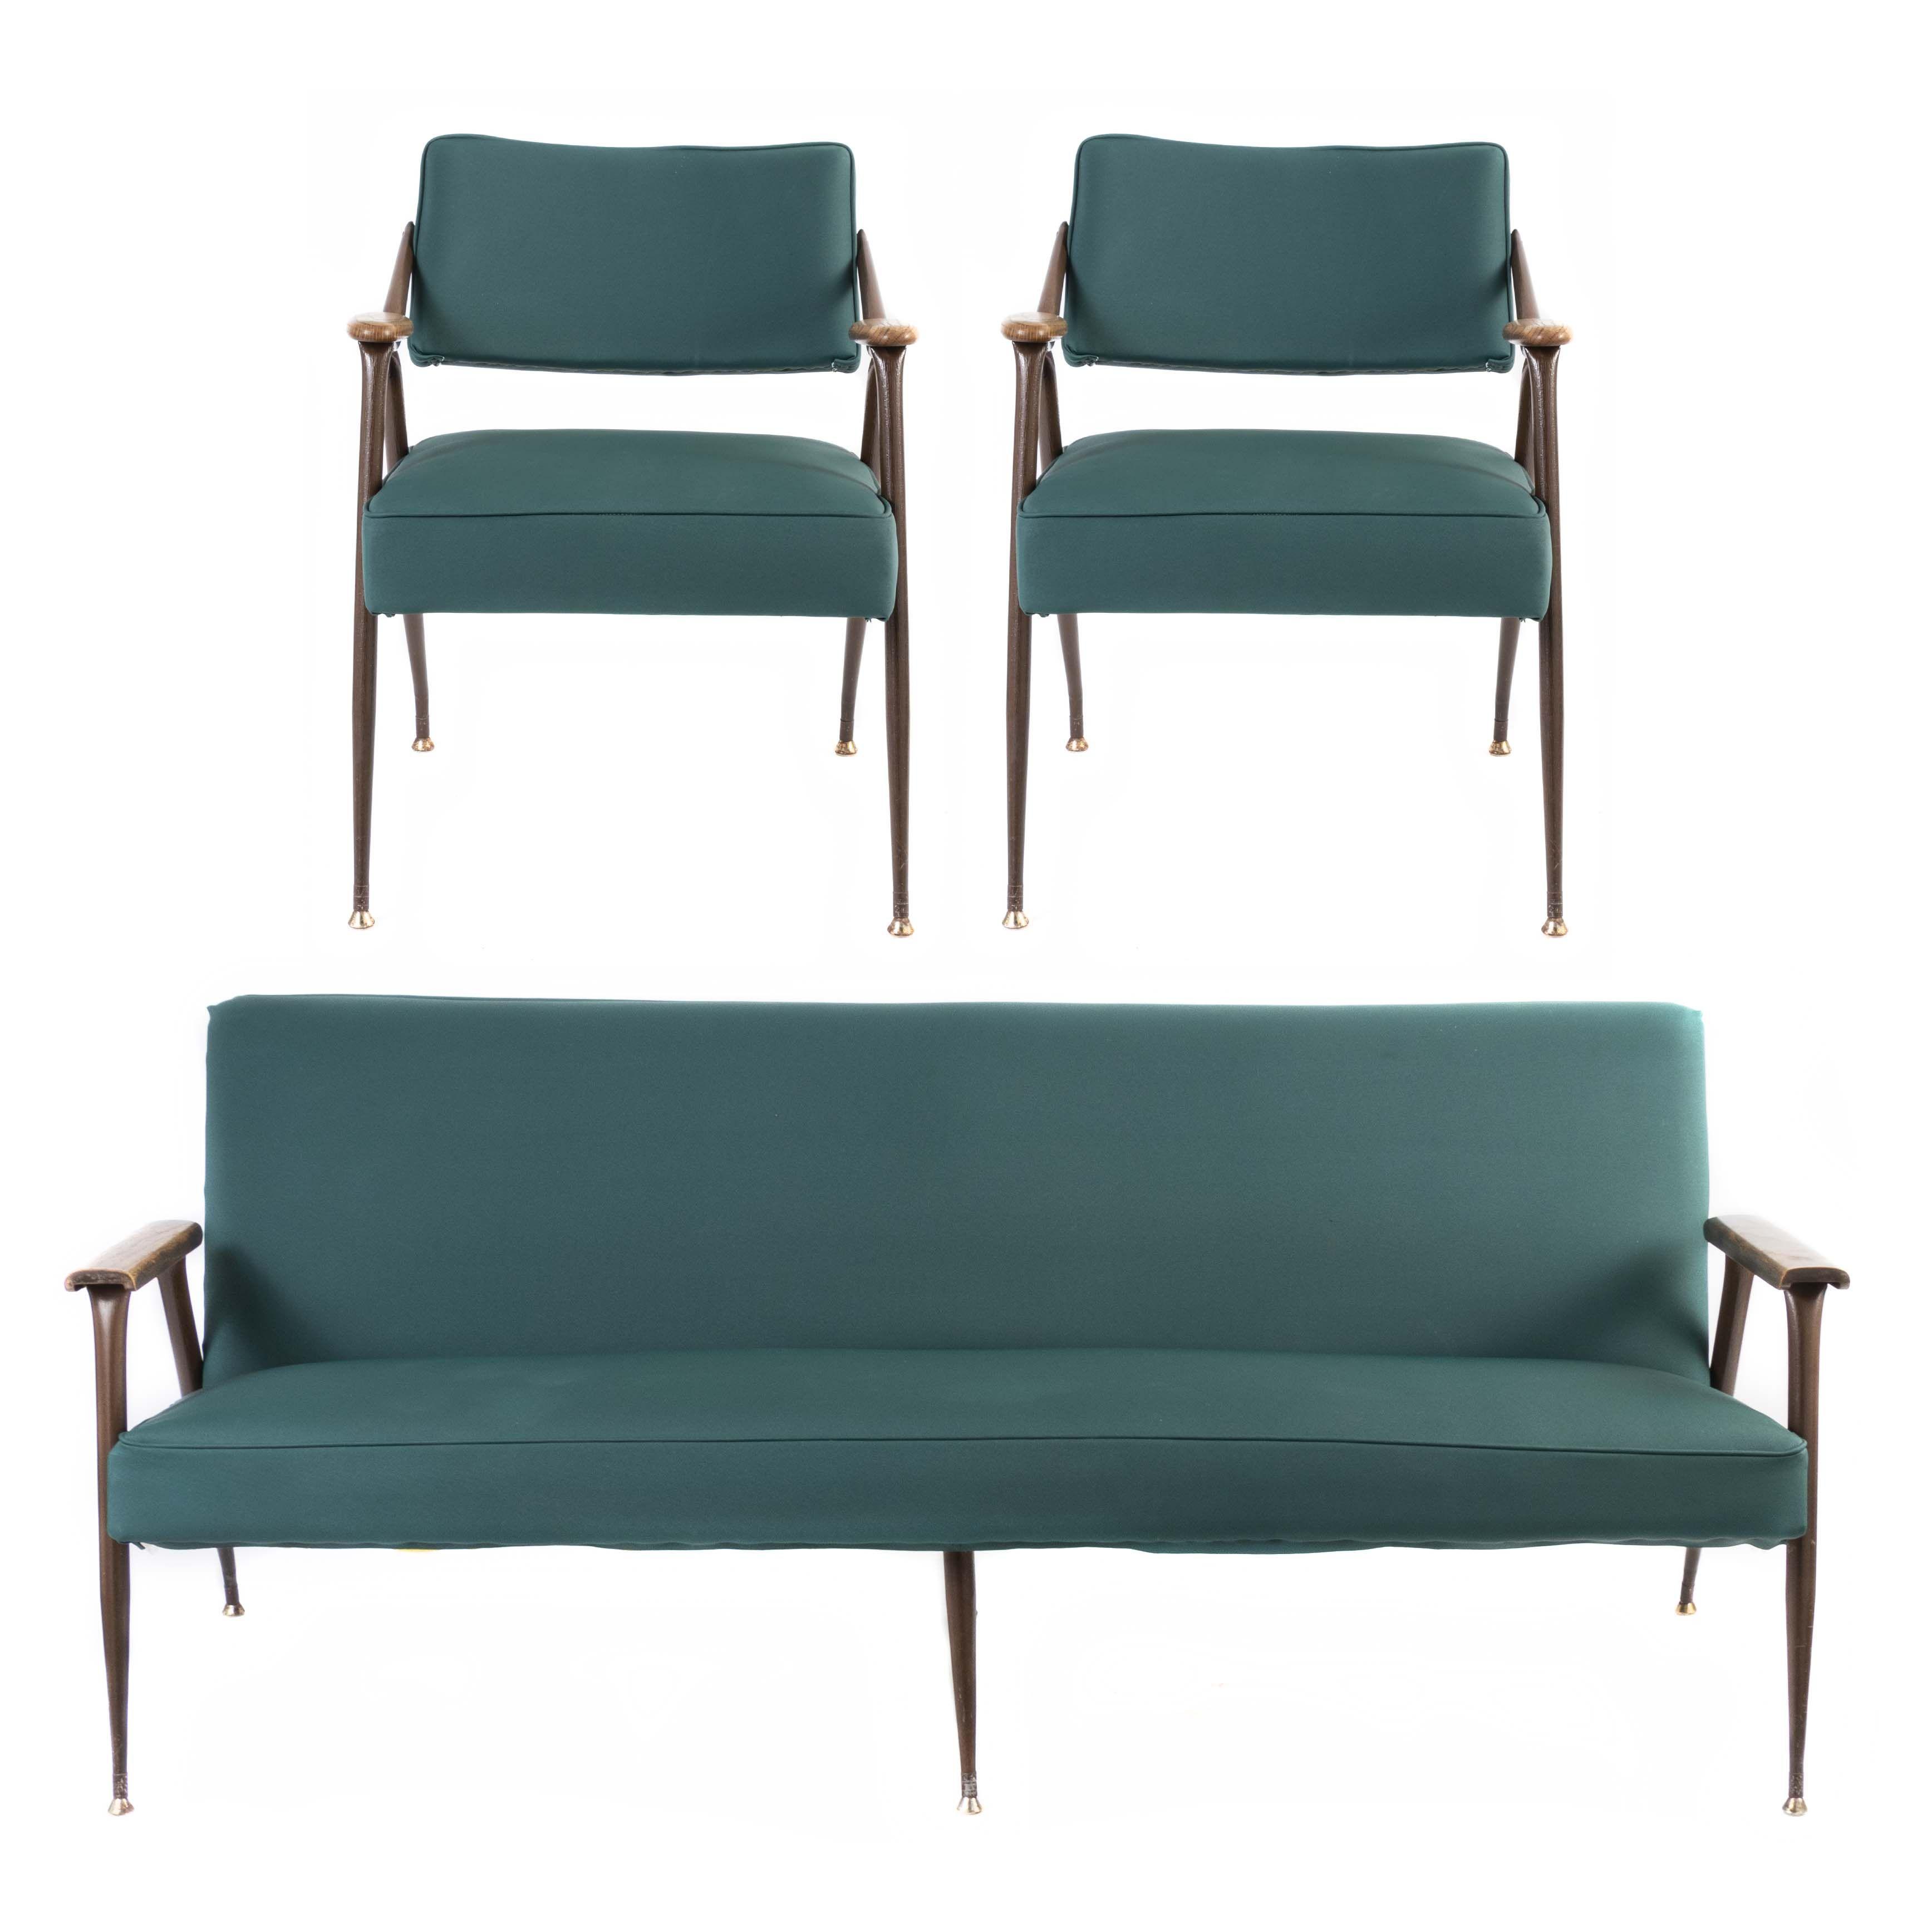 Fine From Baumritter Corporations Viko Line Of Danish Modern Evergreenethics Interior Chair Design Evergreenethicsorg